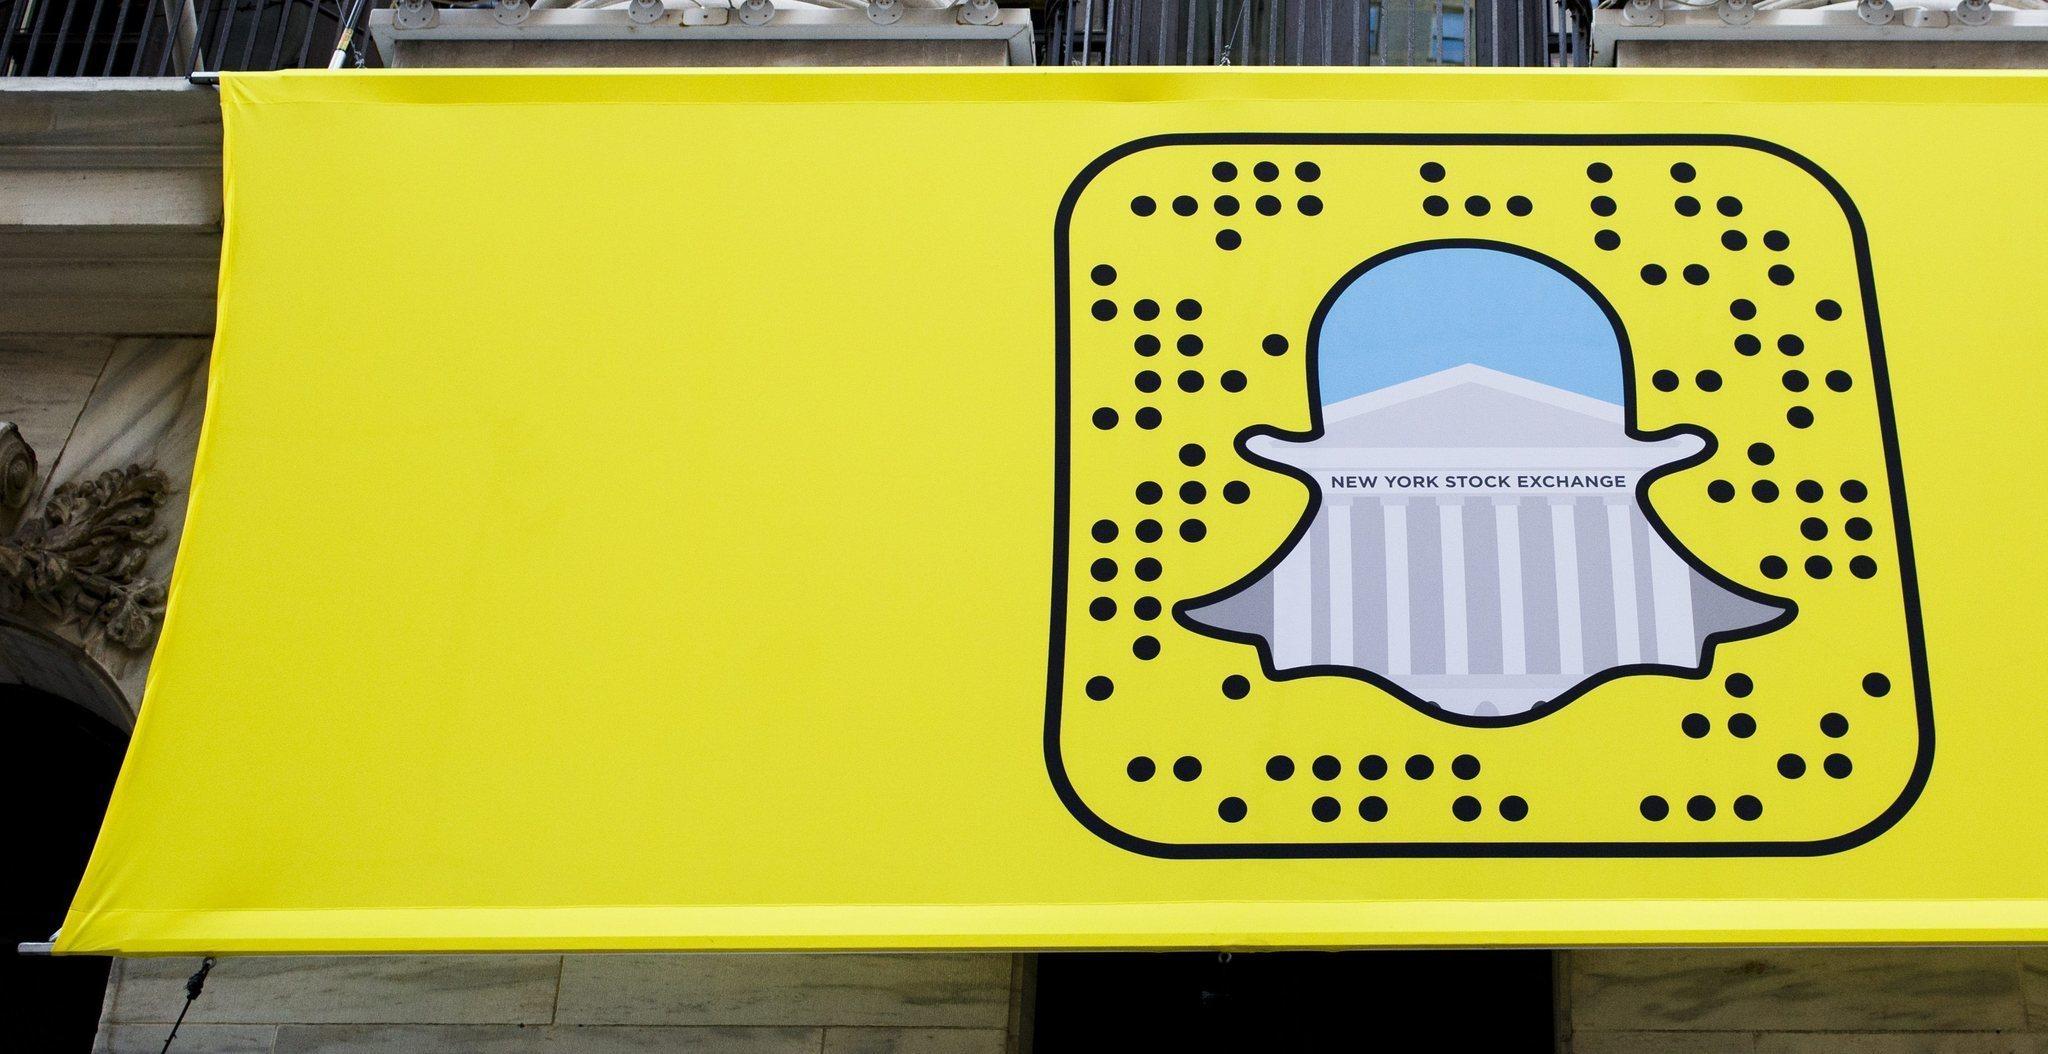 Snapchat showed investors false user statistics, ex-employee alleges in lawsuit